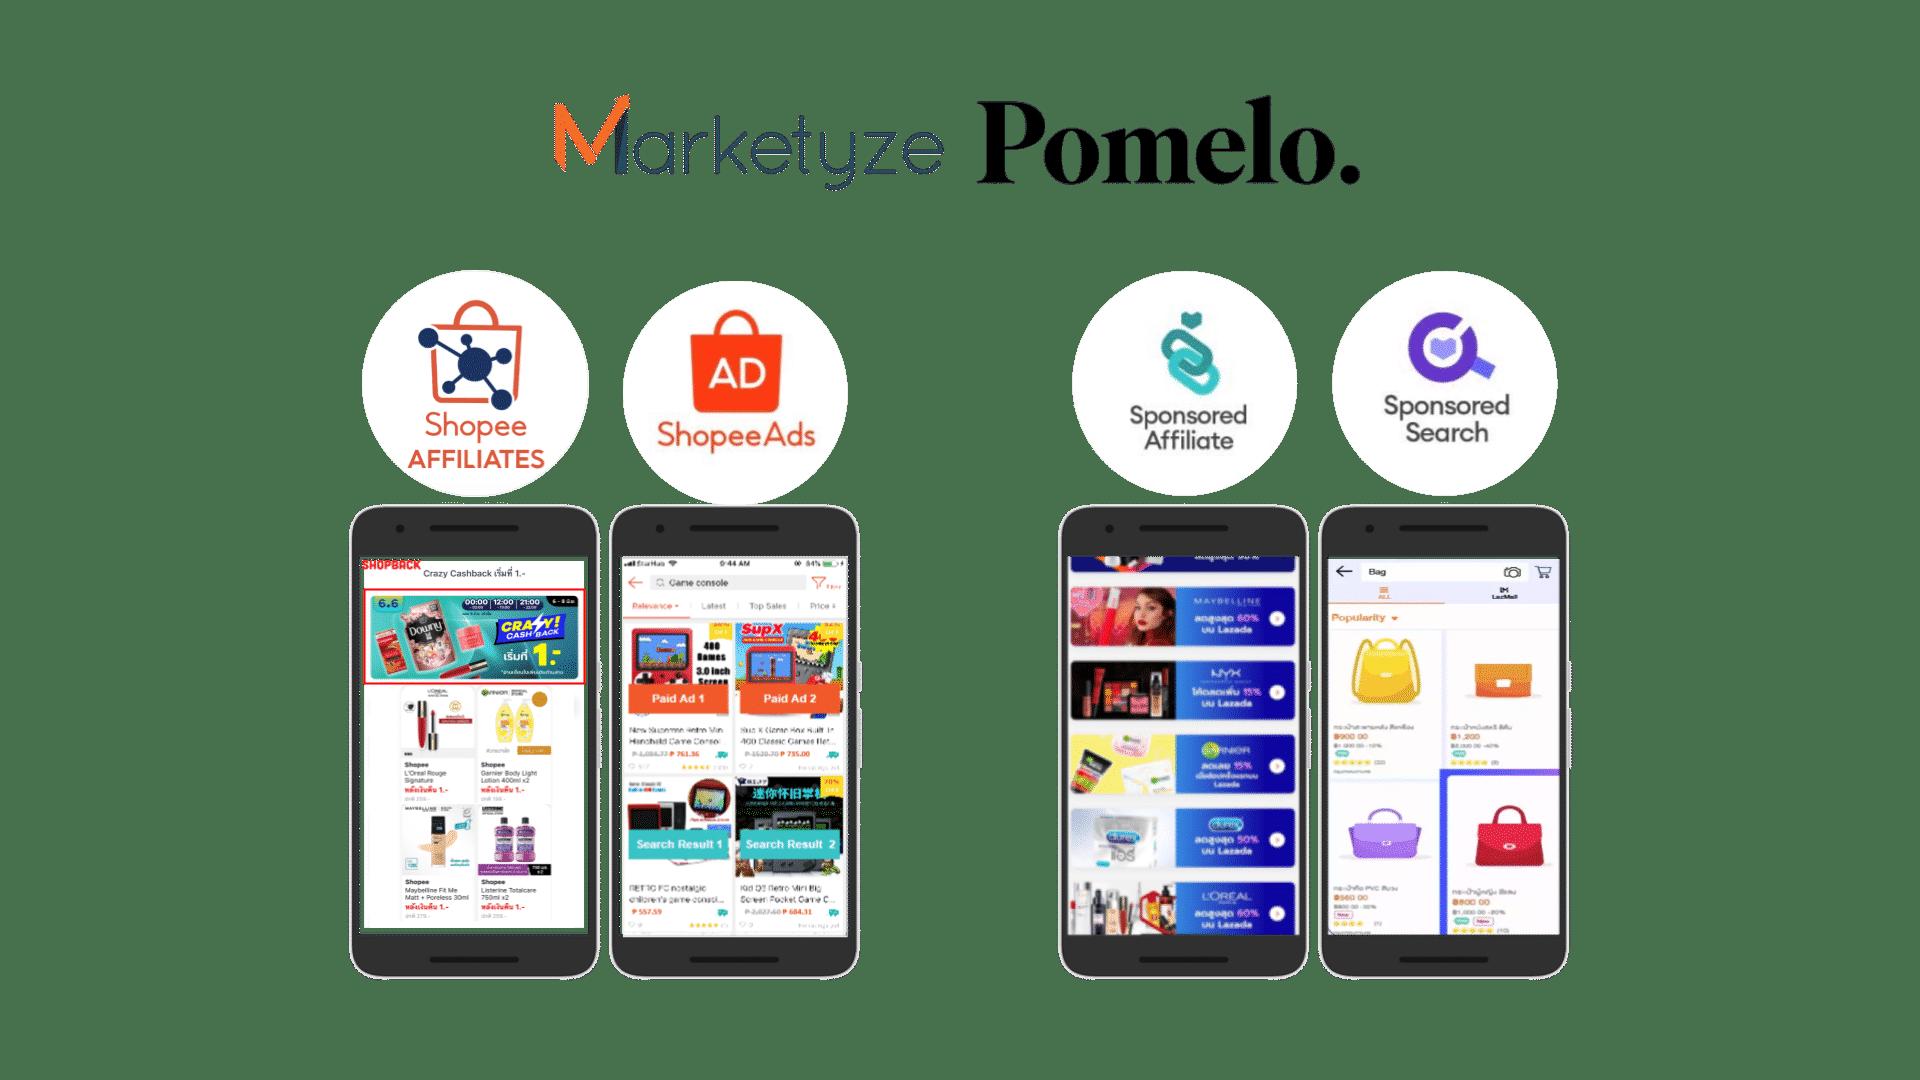 Pomelo platform ads - Shopee Ads, Lazada Ads